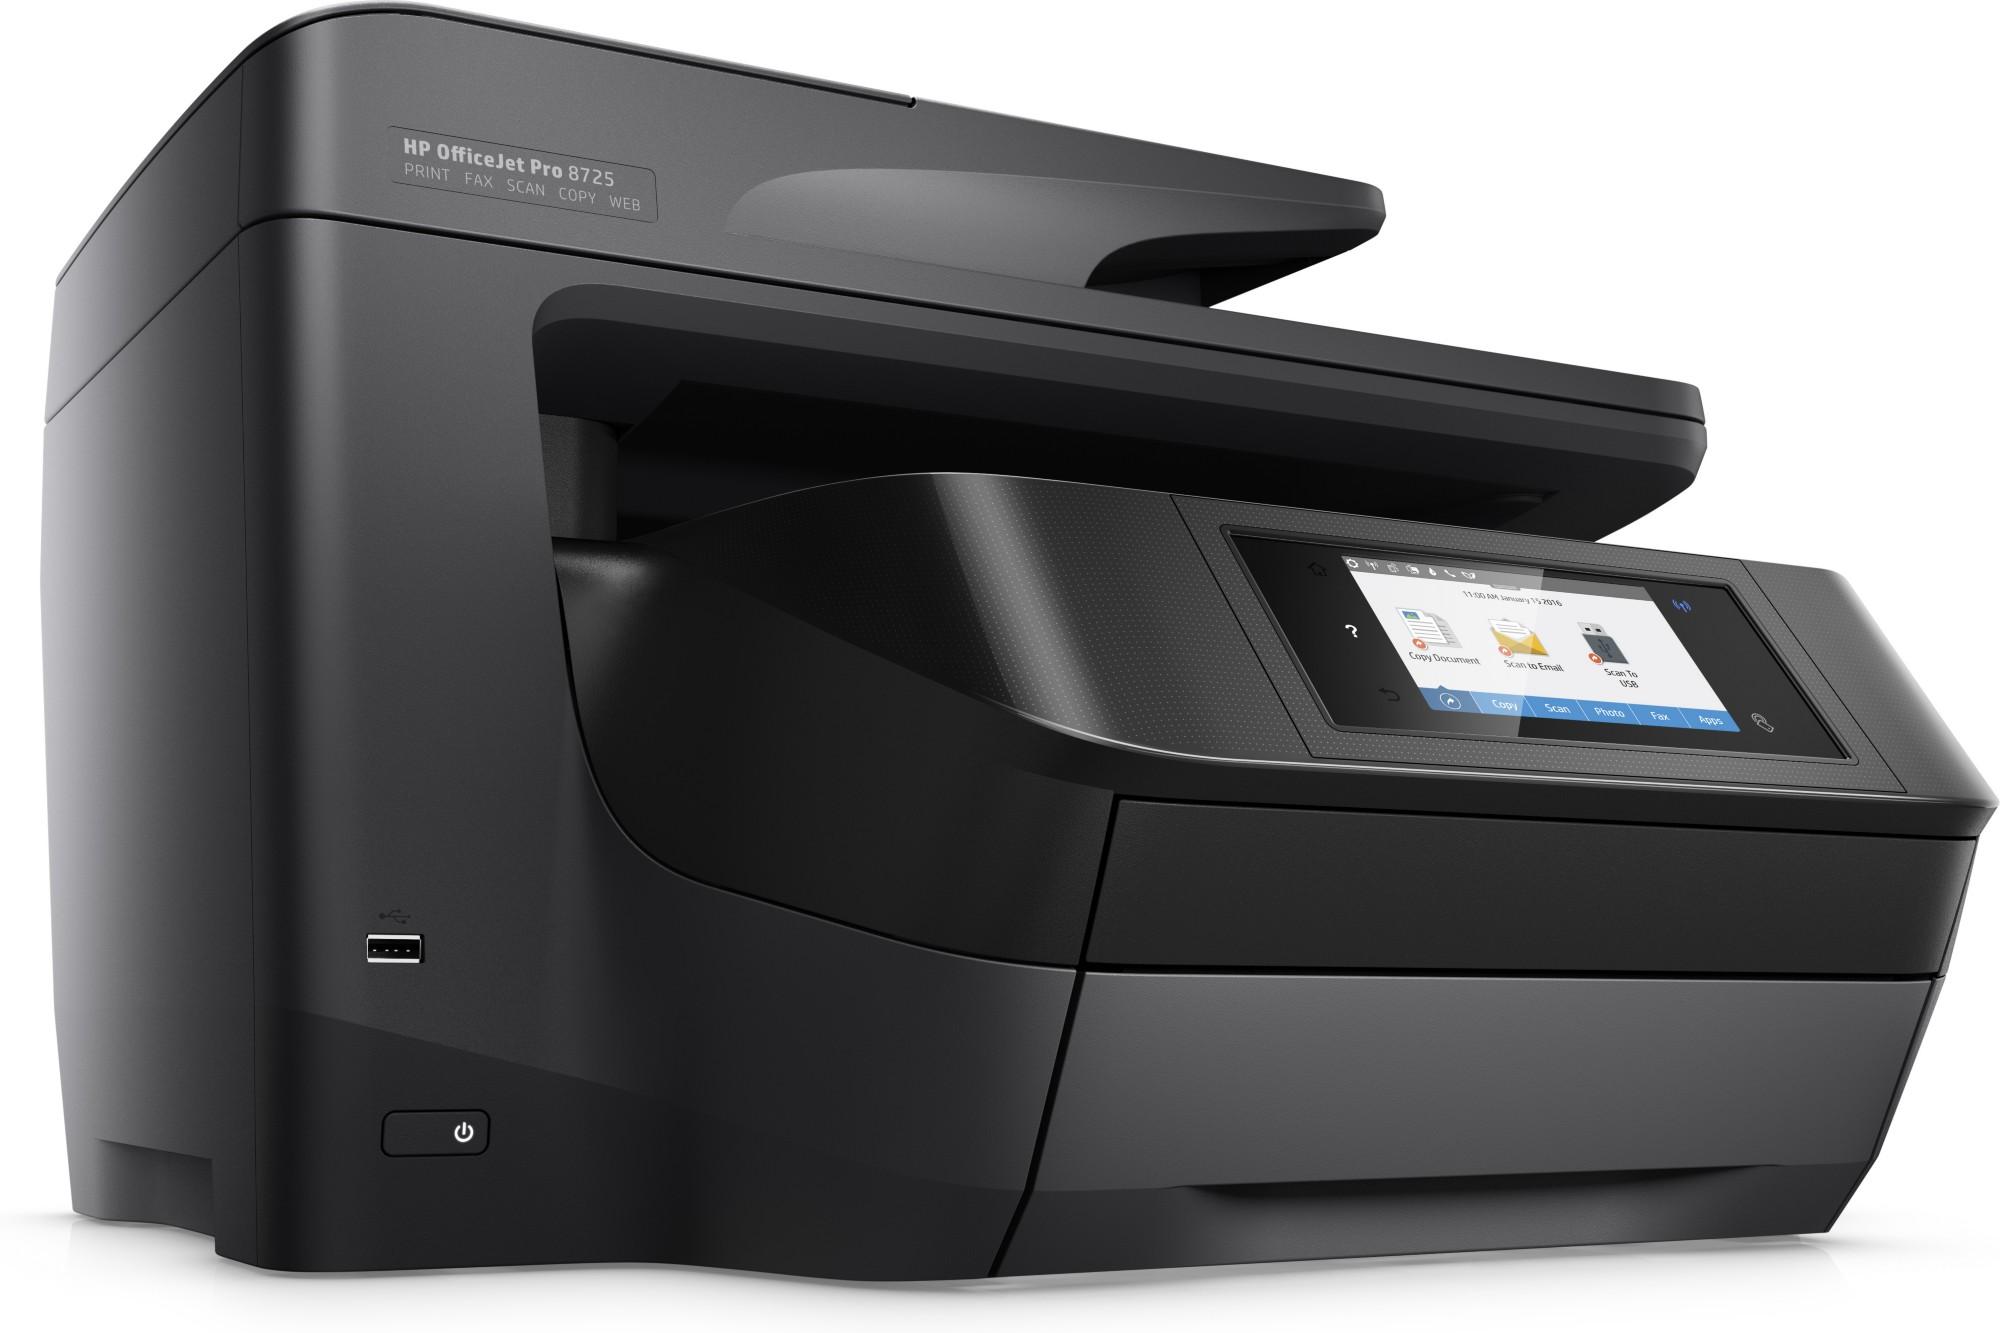 Impresora-Multifuncion-HP-Officejet-Pro-8720-Blanca